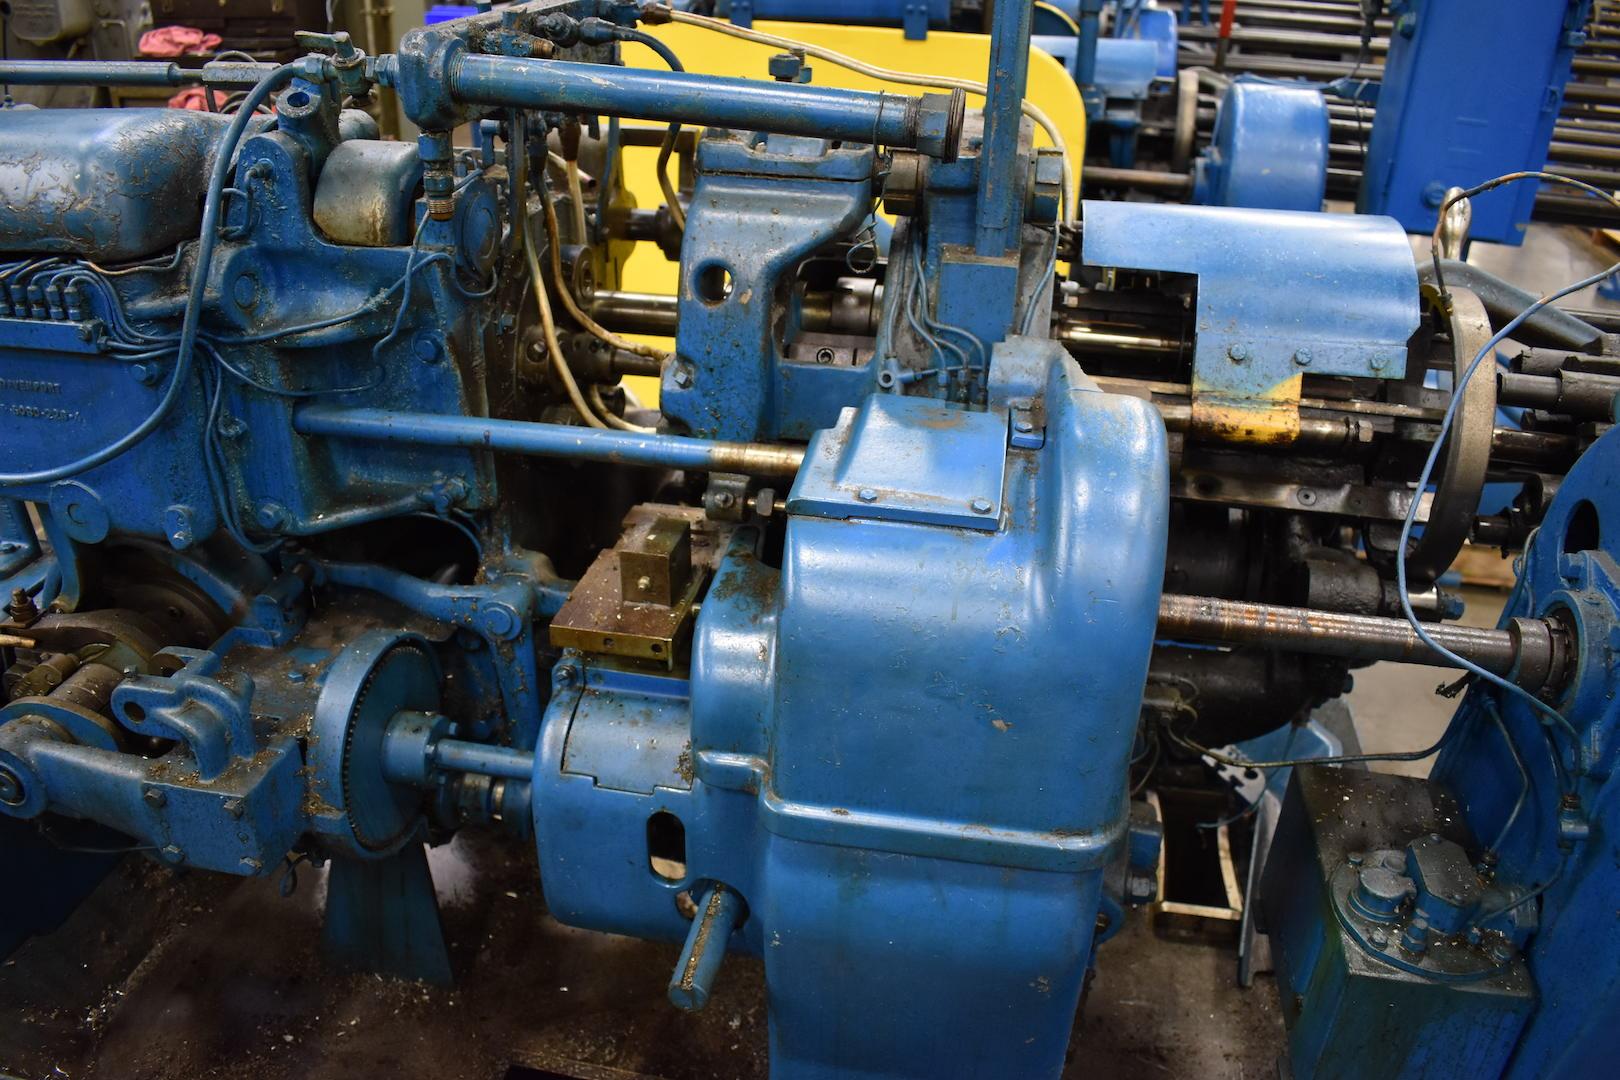 Lot 38 - DAVENPORT MODEL B OVERSIZE 5-SPINDLE AUTOMATIC SCREW MACHINE